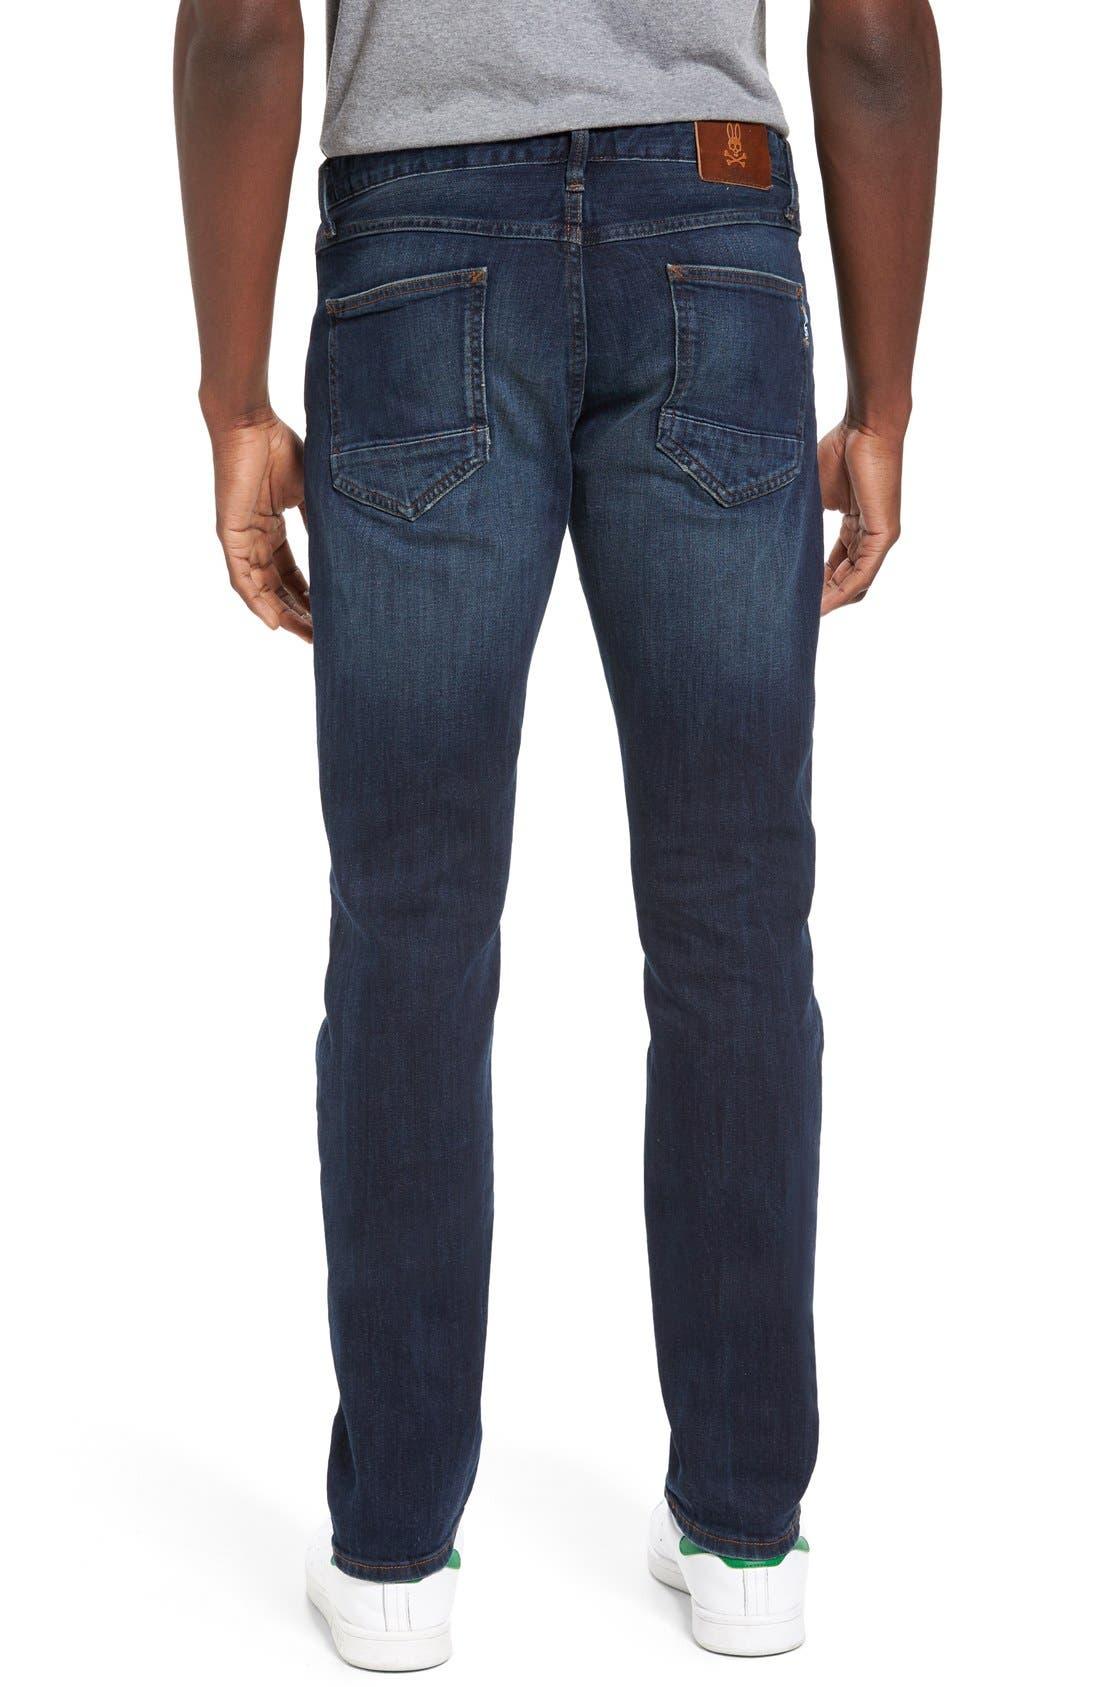 Spitfire Slim Fit Jeans,                             Alternate thumbnail 4, color,                             INDIGO